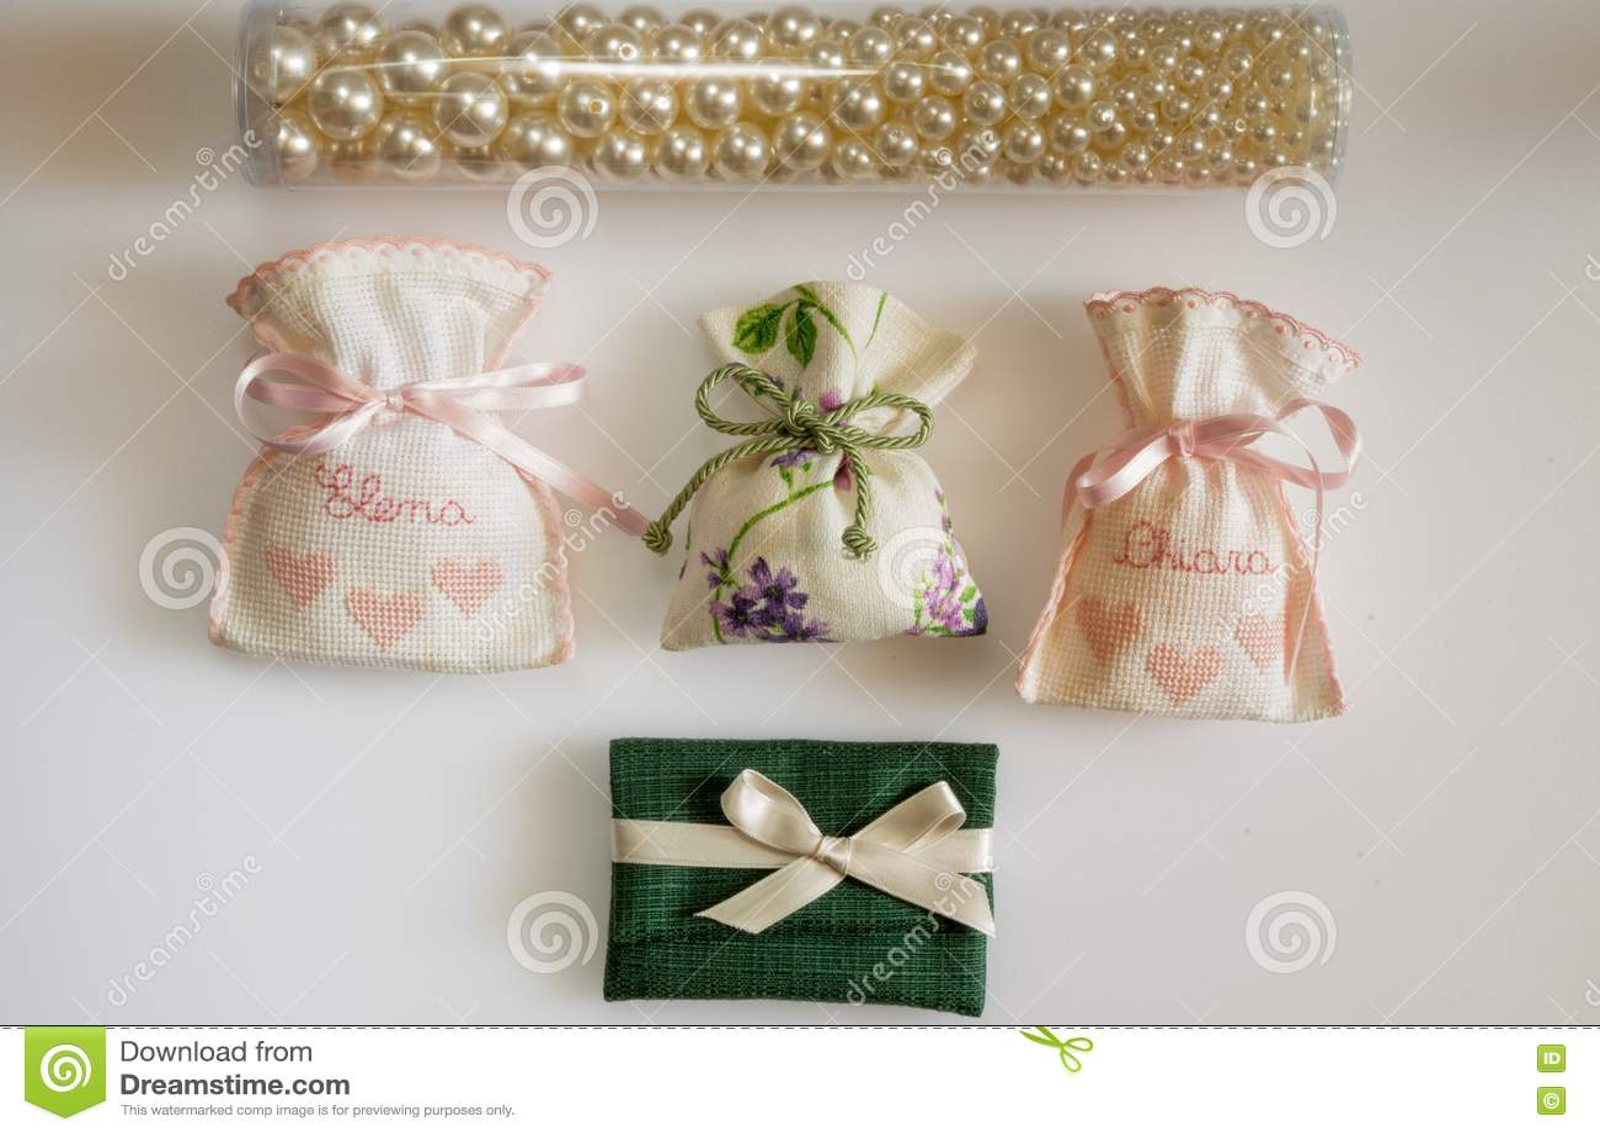 indian wedding favors bags wedding favor bags Cheap Indian Wedding Favors